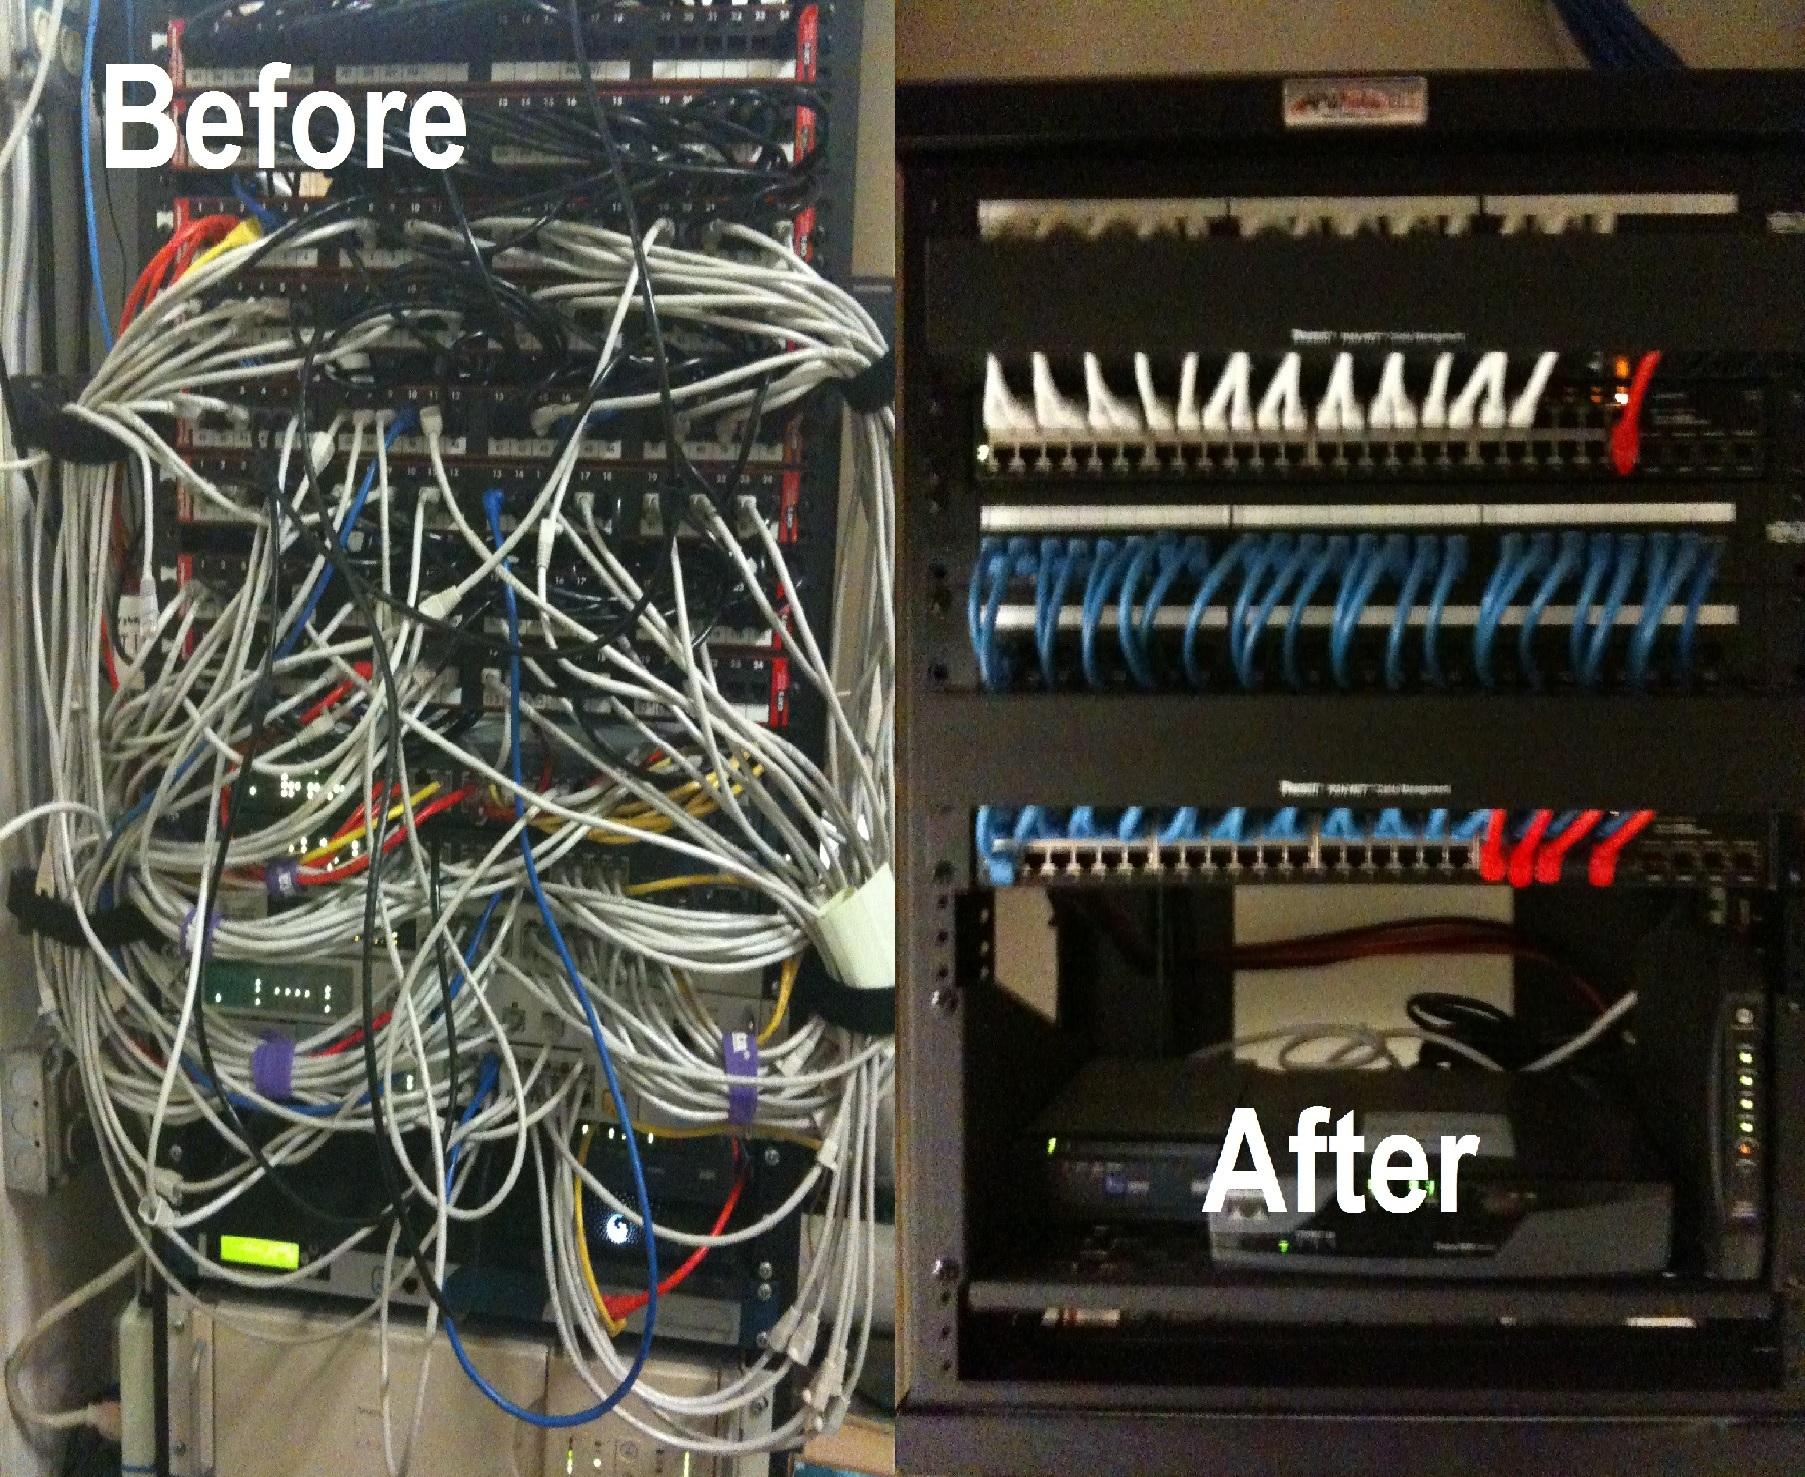 WalkerITC - Computer Repair - Network and IT Service - Texarkana image 2